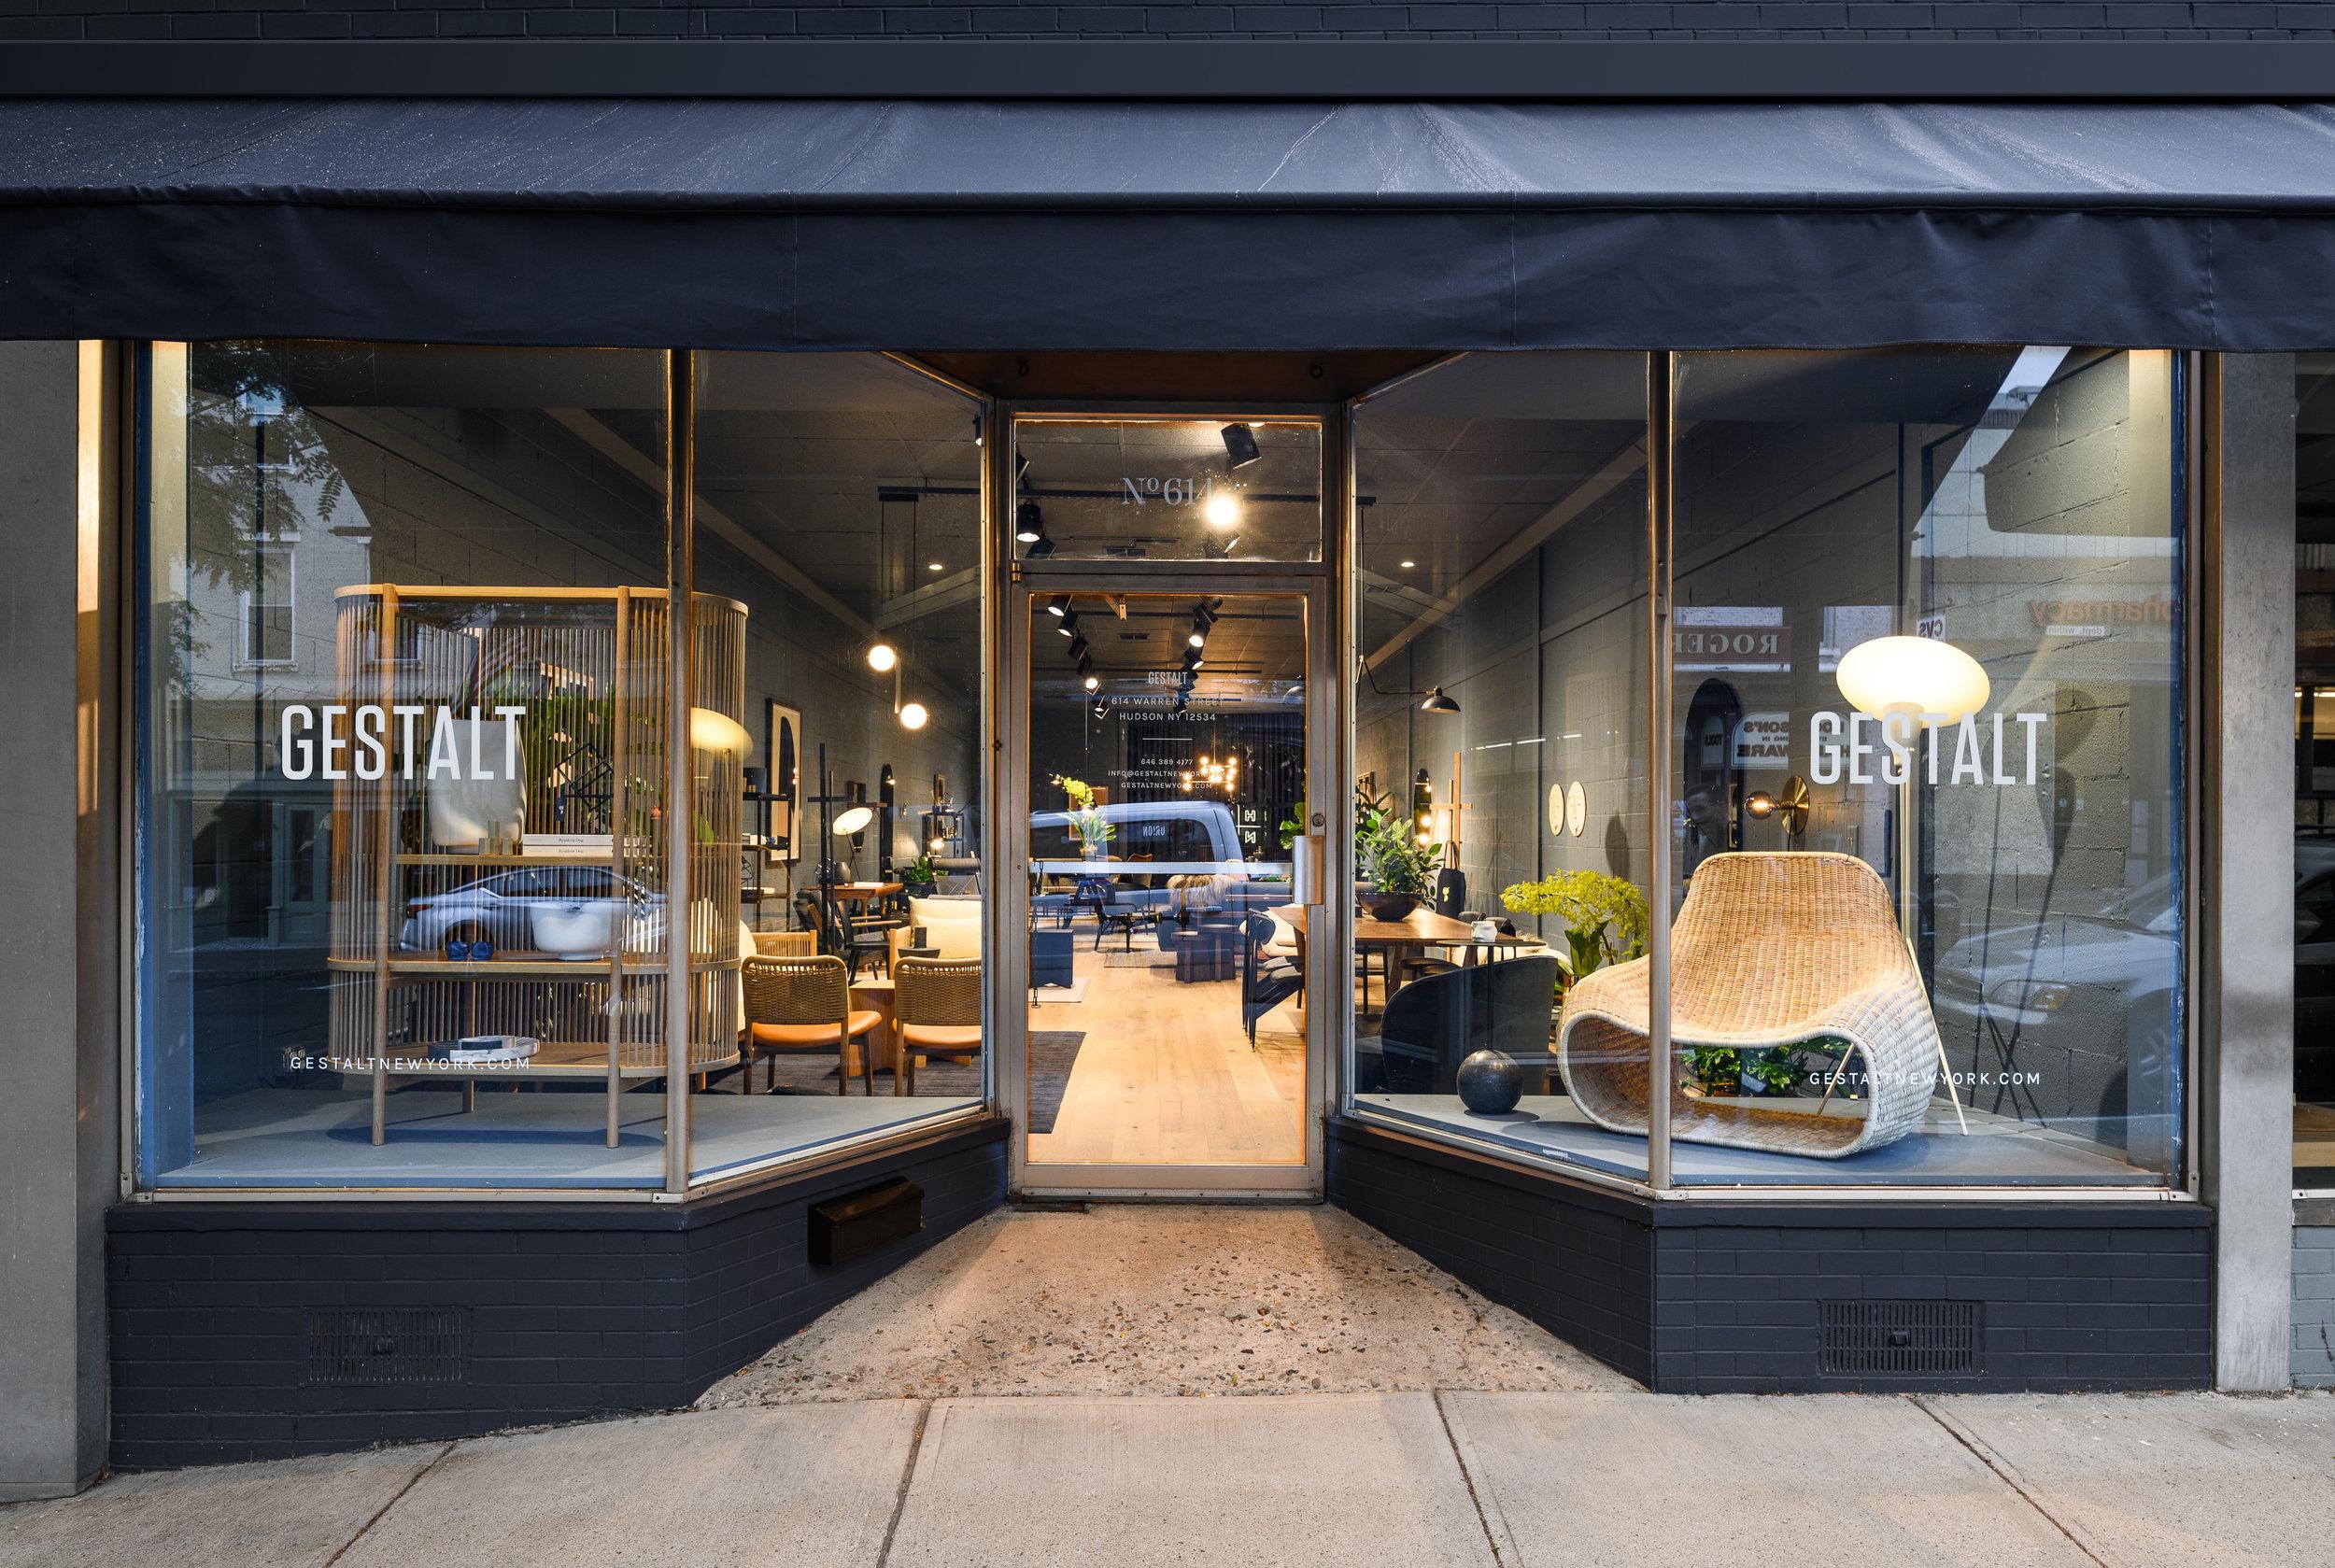 Gestalt New York Hudson showroom on Warren Street.  All photography by Stephen K Mack @gnomistphoto